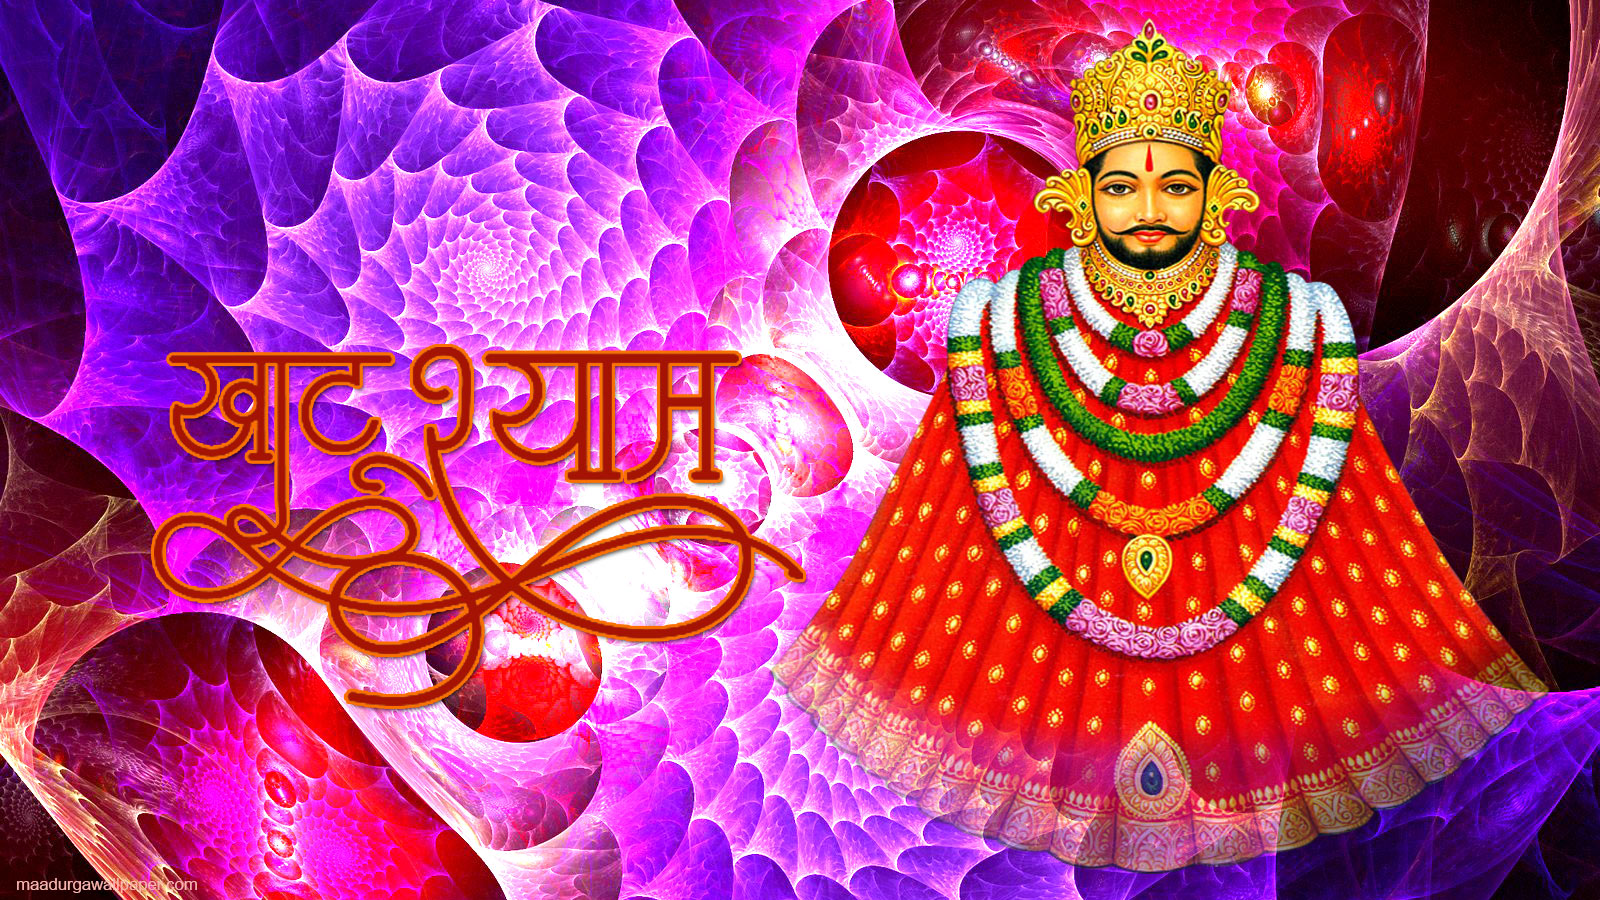 Shyam Baba Wallpaper Shri Khatu Shyam Ji Mandir 3095808 Hd Wallpaper Backgrounds Download